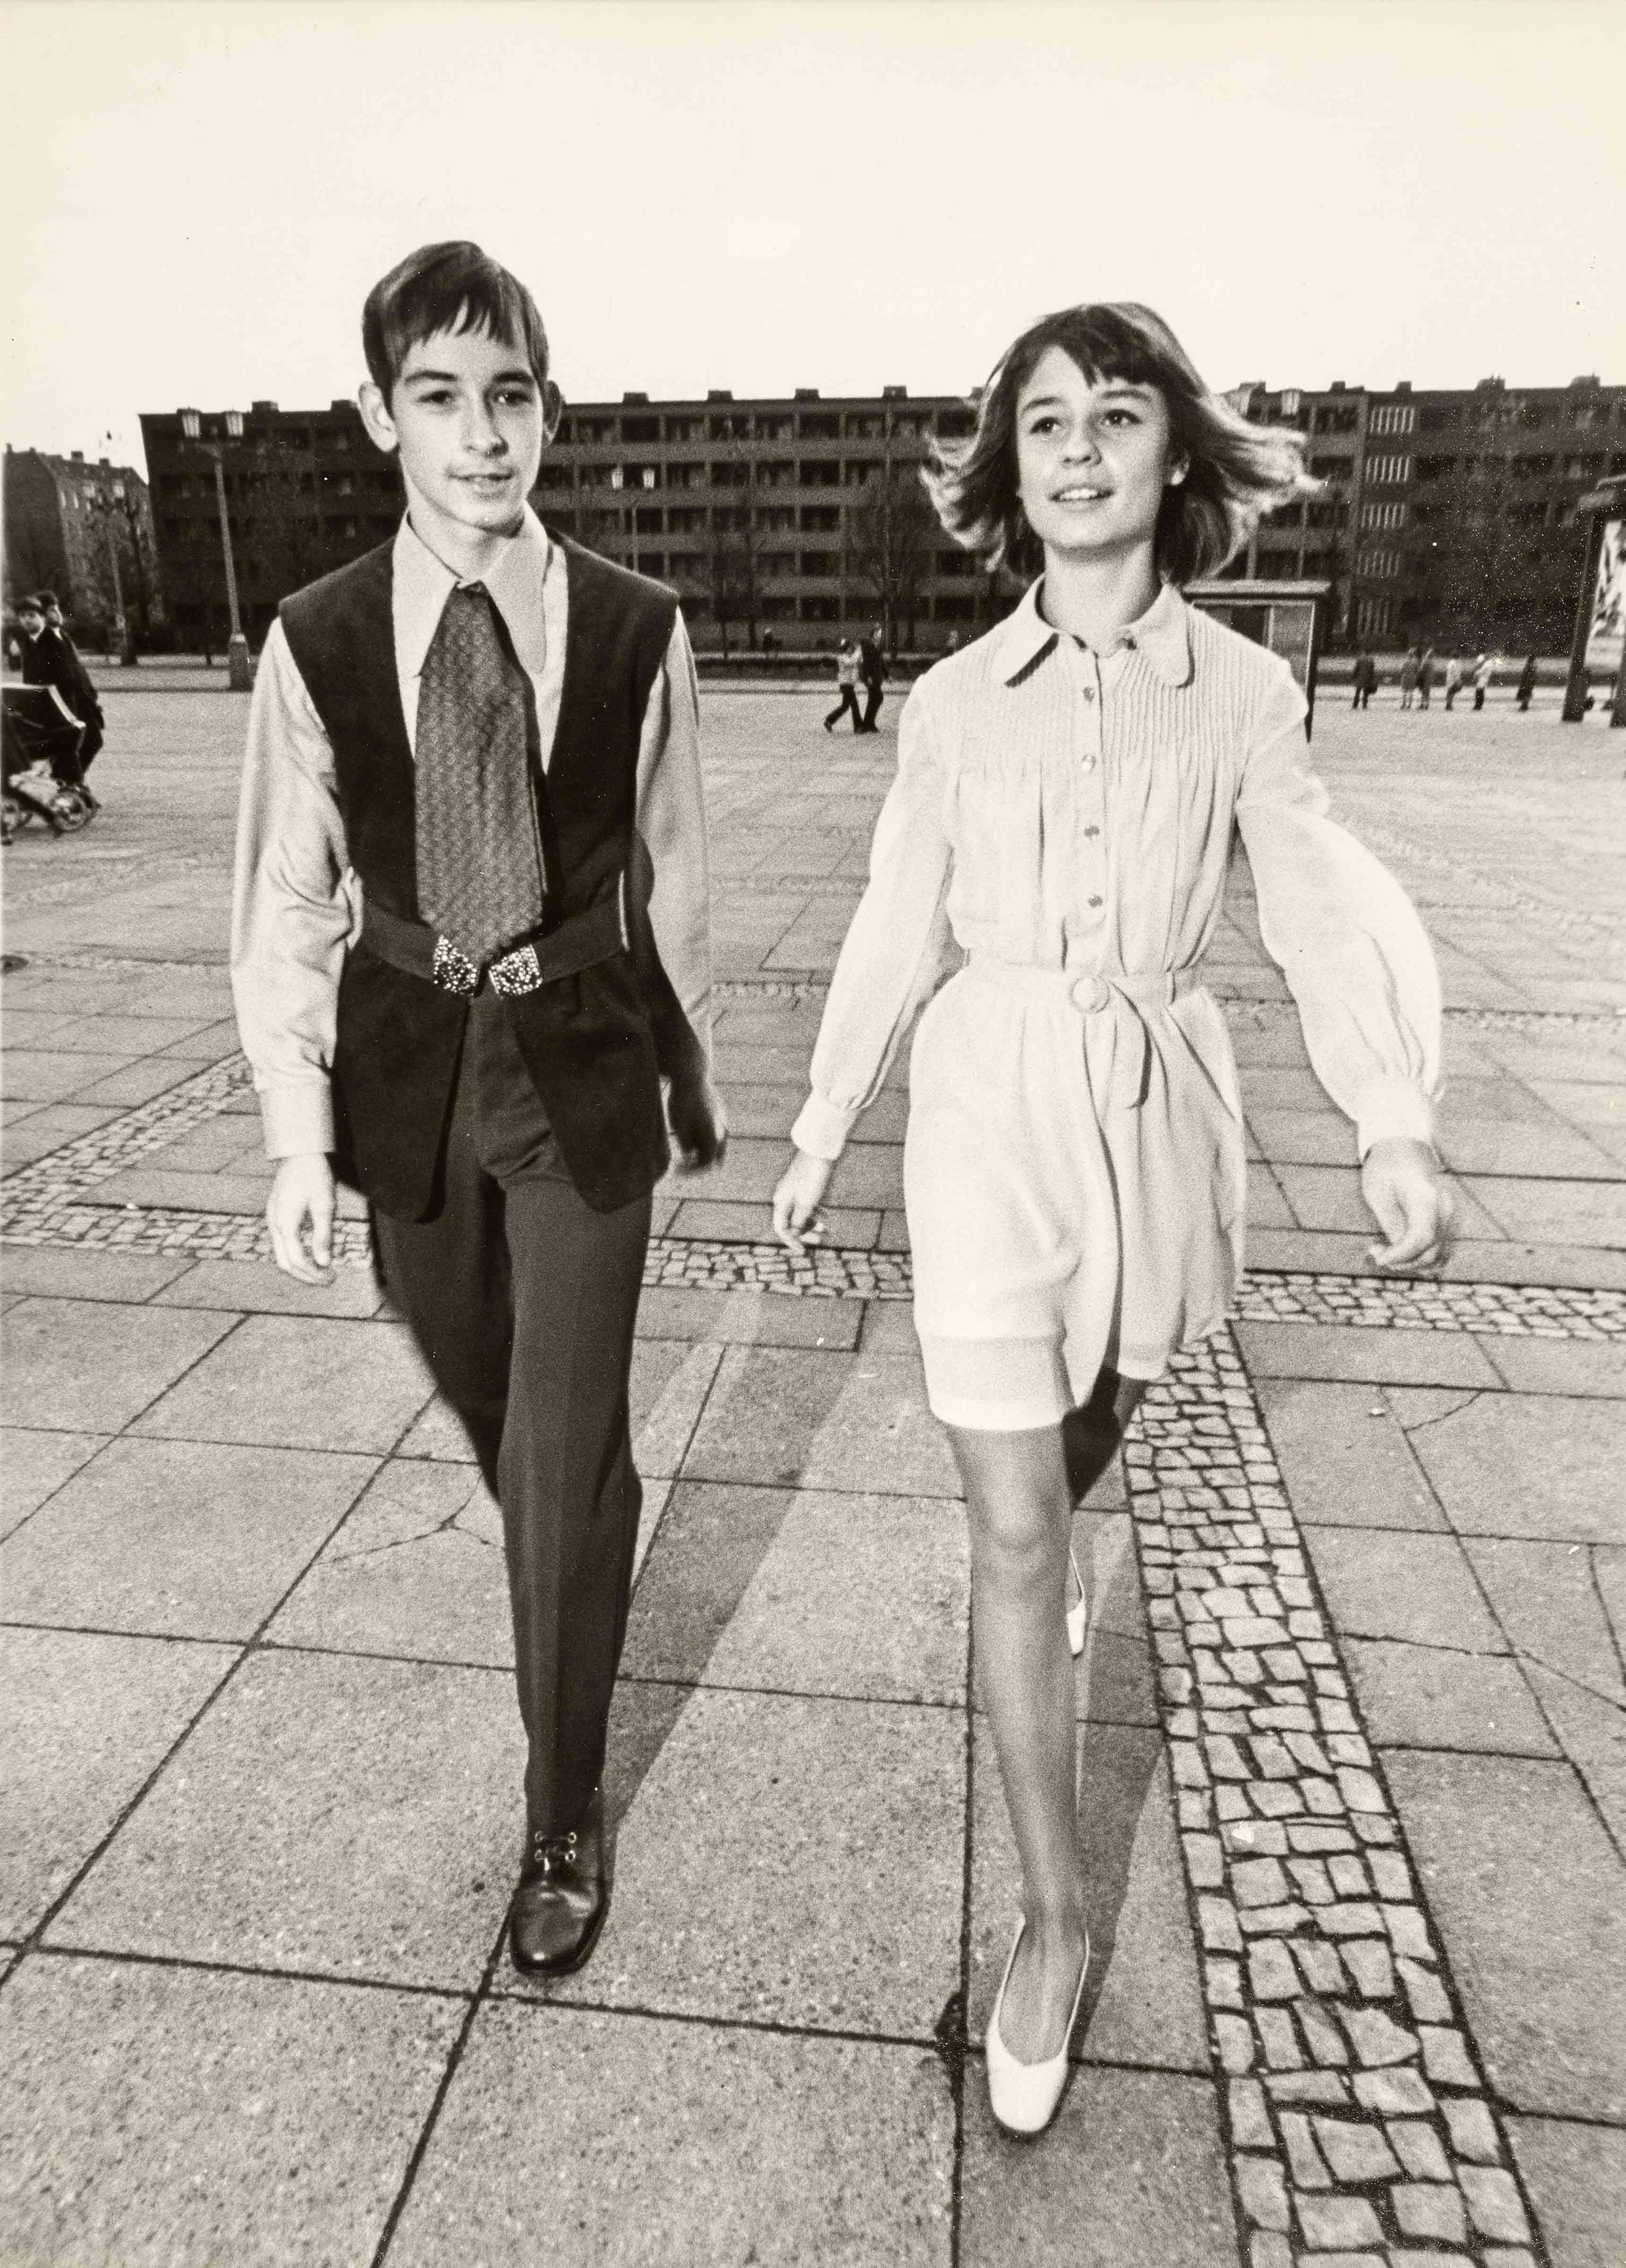 Schlüterstraße 28 Tel  +49 30 28 38 79 90         info@berinson.deD-10629 Berlin  Fax +49 30 28 38 79 99         www.berinson.deFestive dresses | vintage print | 15,6 x 11,8 in | models: German Fashion Institute | 'Sibylle', issue 6, 1971Full-length shirt dress | vintage print | 11,6 x 8,9 in | model design: Eva Mücke, production: Helga Perkuhn | 'Sibylle', issue 6, 1973 Youth initiation (trousers-vest ensemble and shirt dress in lilac 'Dederon-Georgette') | vintage print | 15,7 x 11,7 in | models: German Fashion Institute | 'Sibylle', issue 1, 1971 Galerie Berinson, Berlin